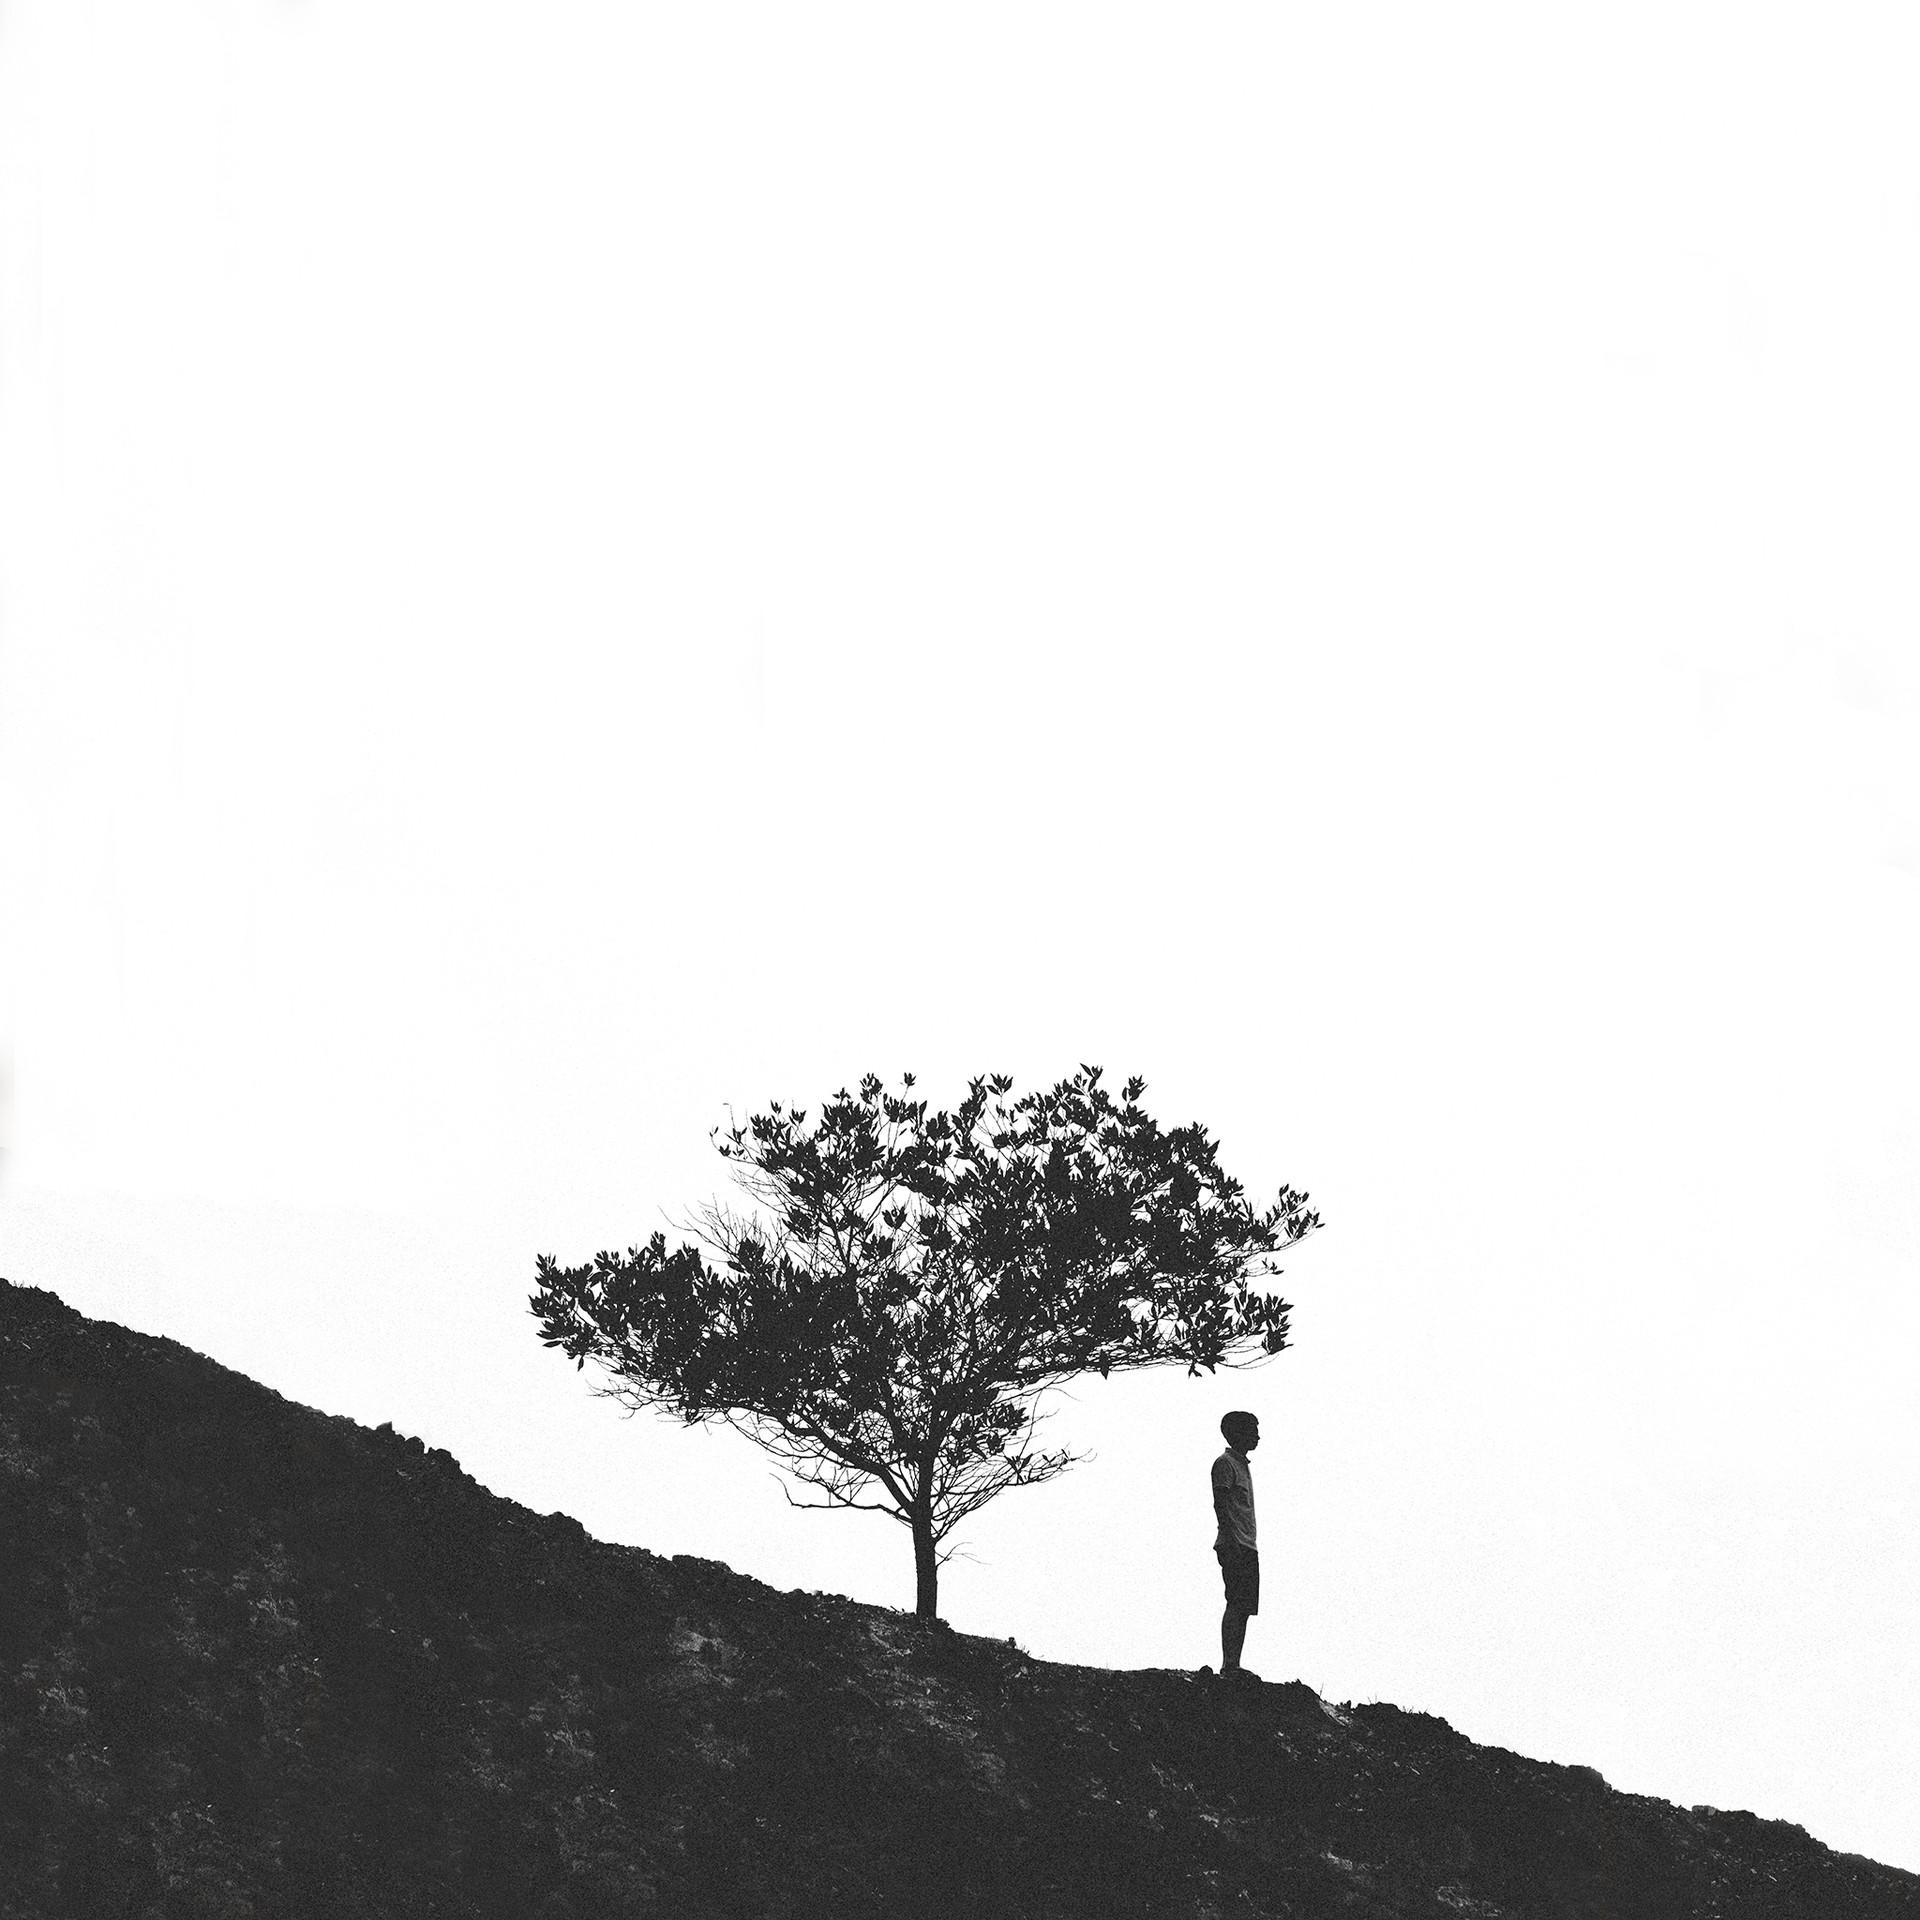 Taiwan Travel Trip Malaysia Kuala Lumpur Melaka Johor Photography Top Best  Photographer Puncak Alam Shah Alam Black and White Alone Tree Portrait